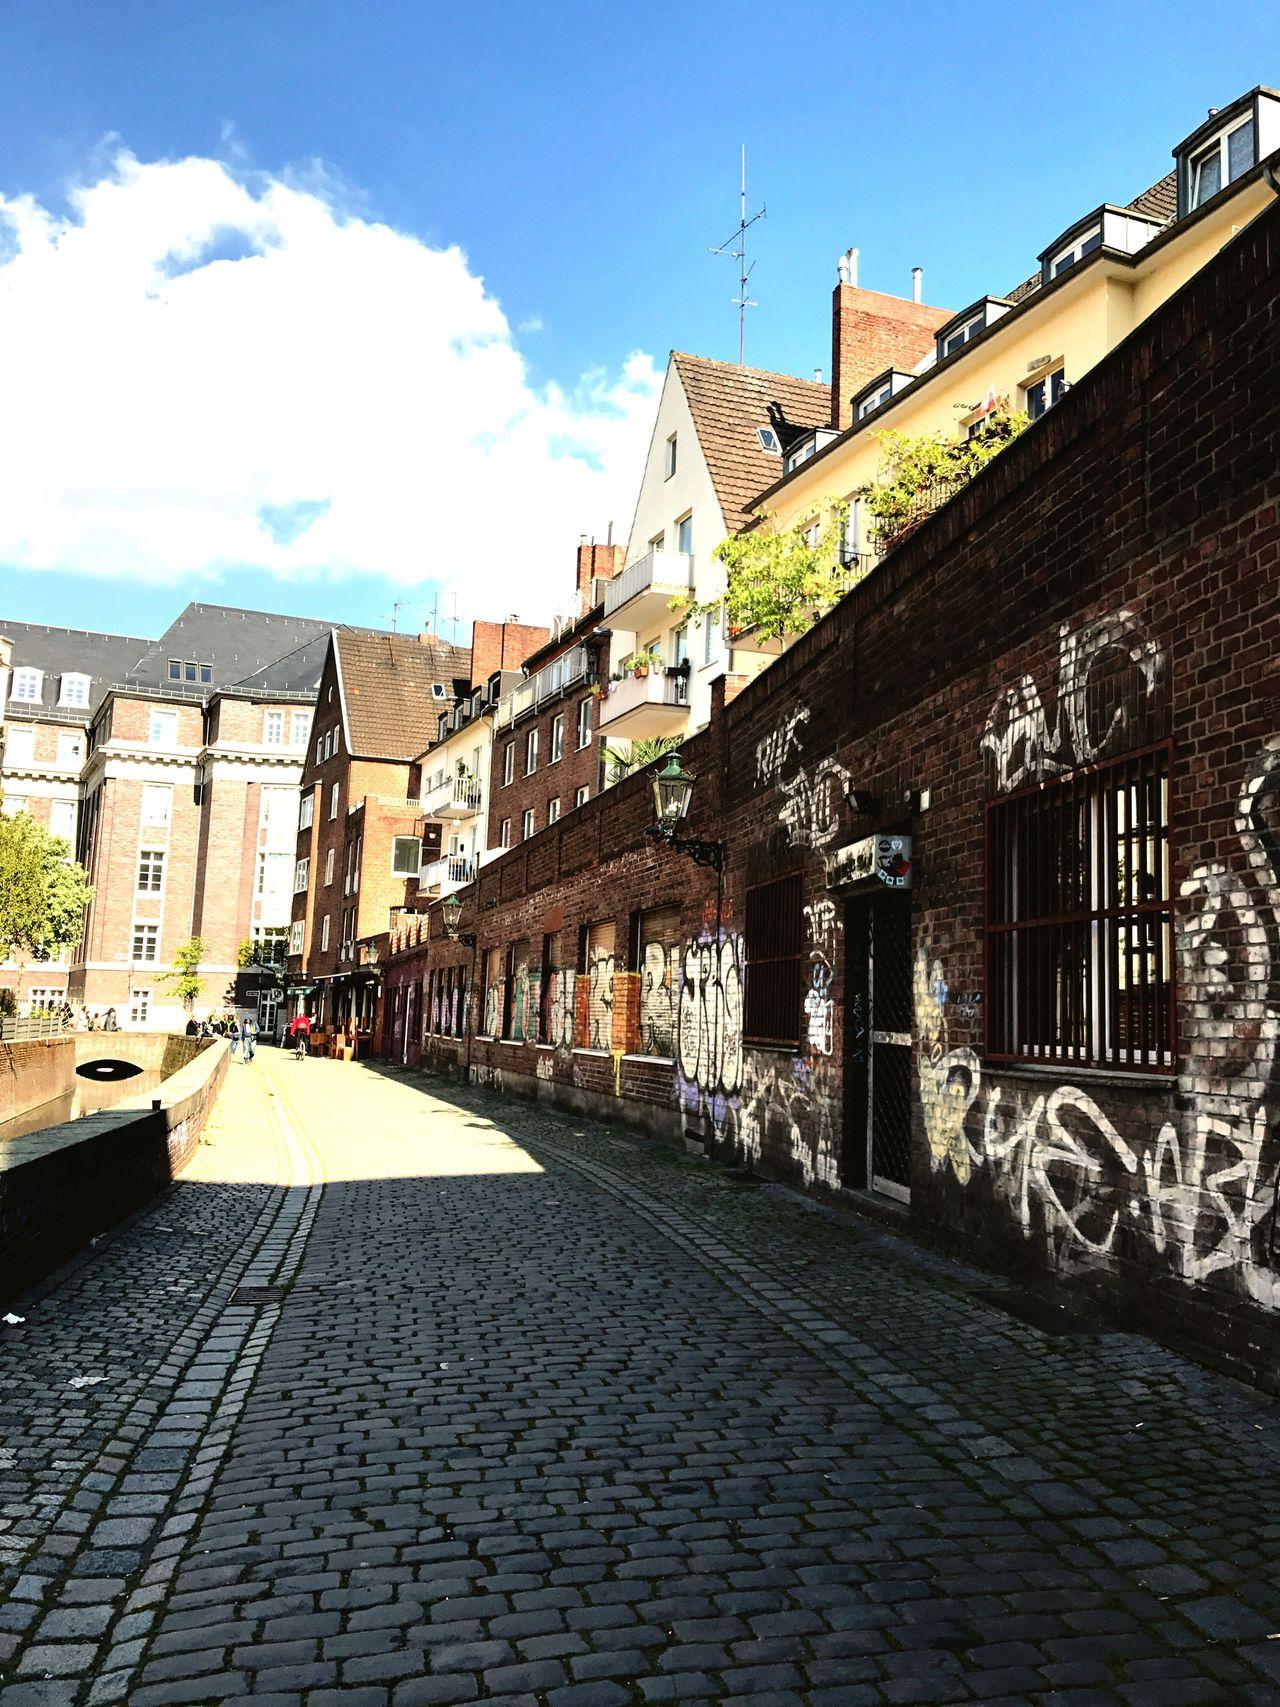 Streetviewphotography Darmstadt, Germany Streetstyle Graffiti Art